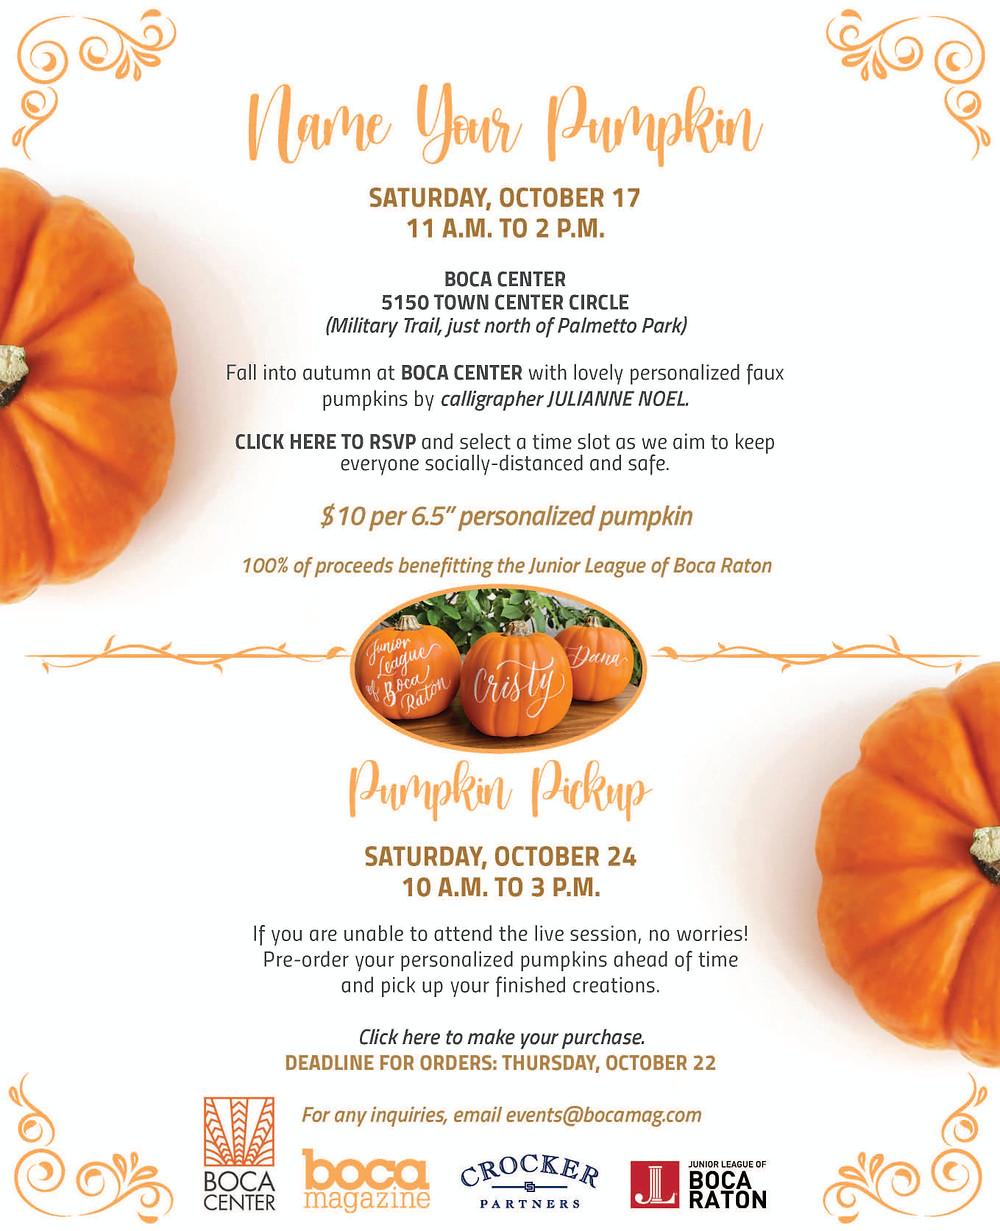 Name Your Pumpkin Event | #FallFeelsatBocaCenter